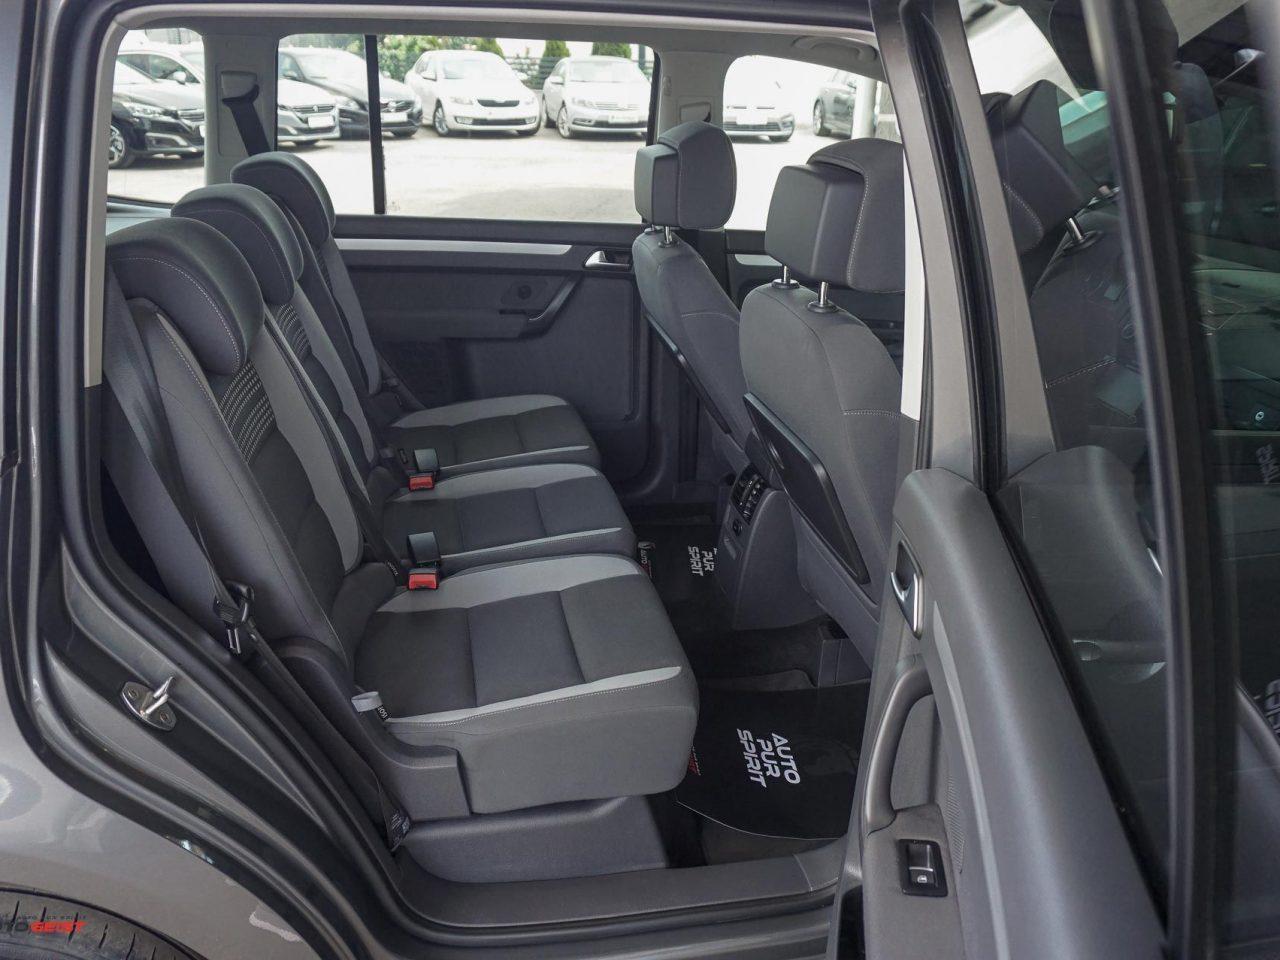 661-volkswagen-touran-gri-manual-01835